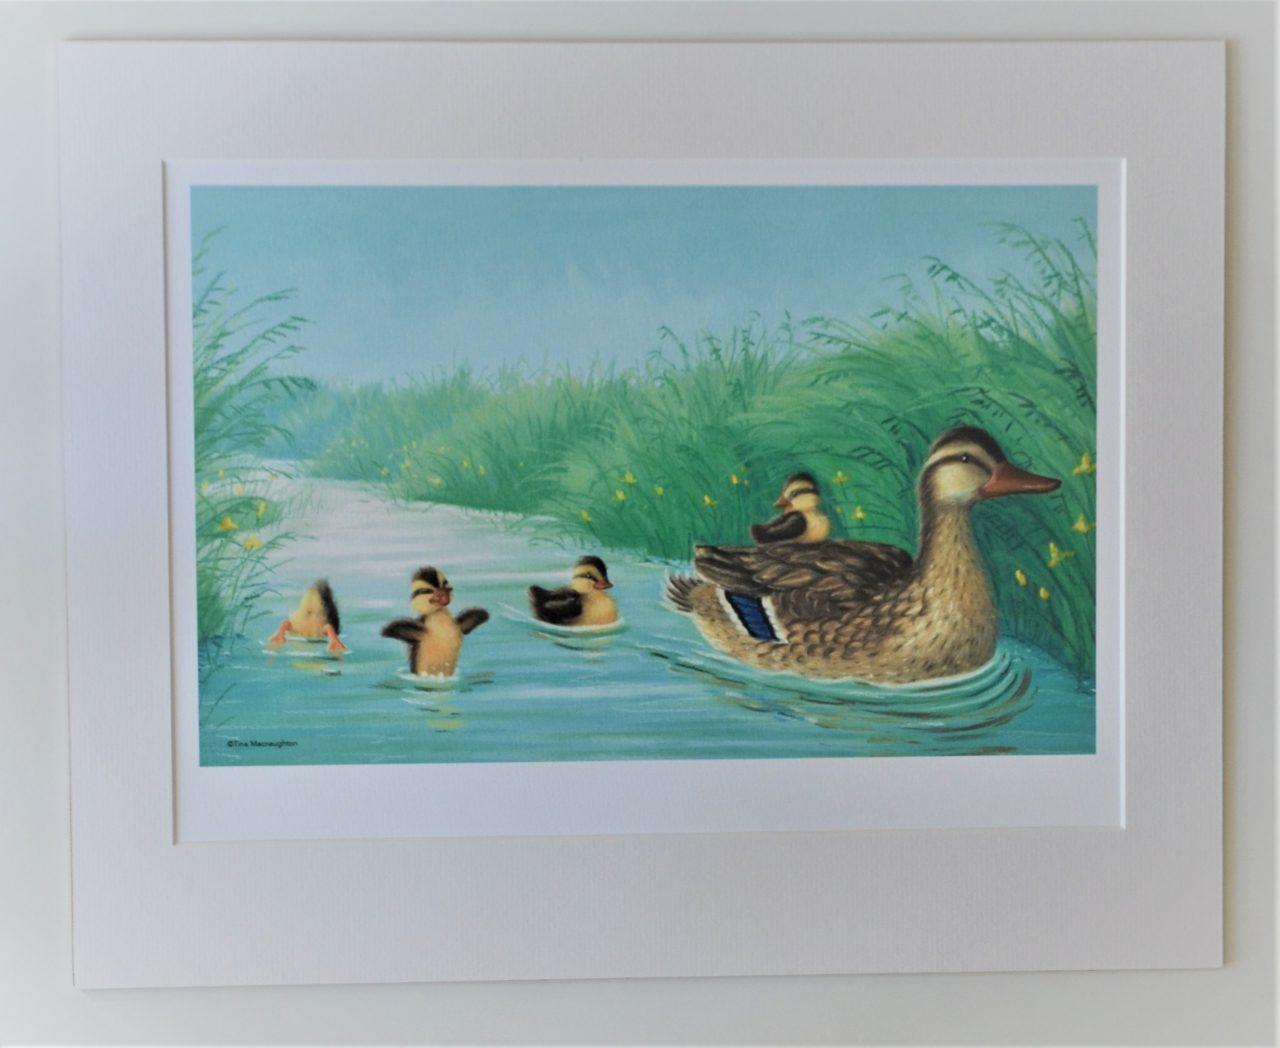 Mallard Duck and four Ducklings by Tina Macnaughton.